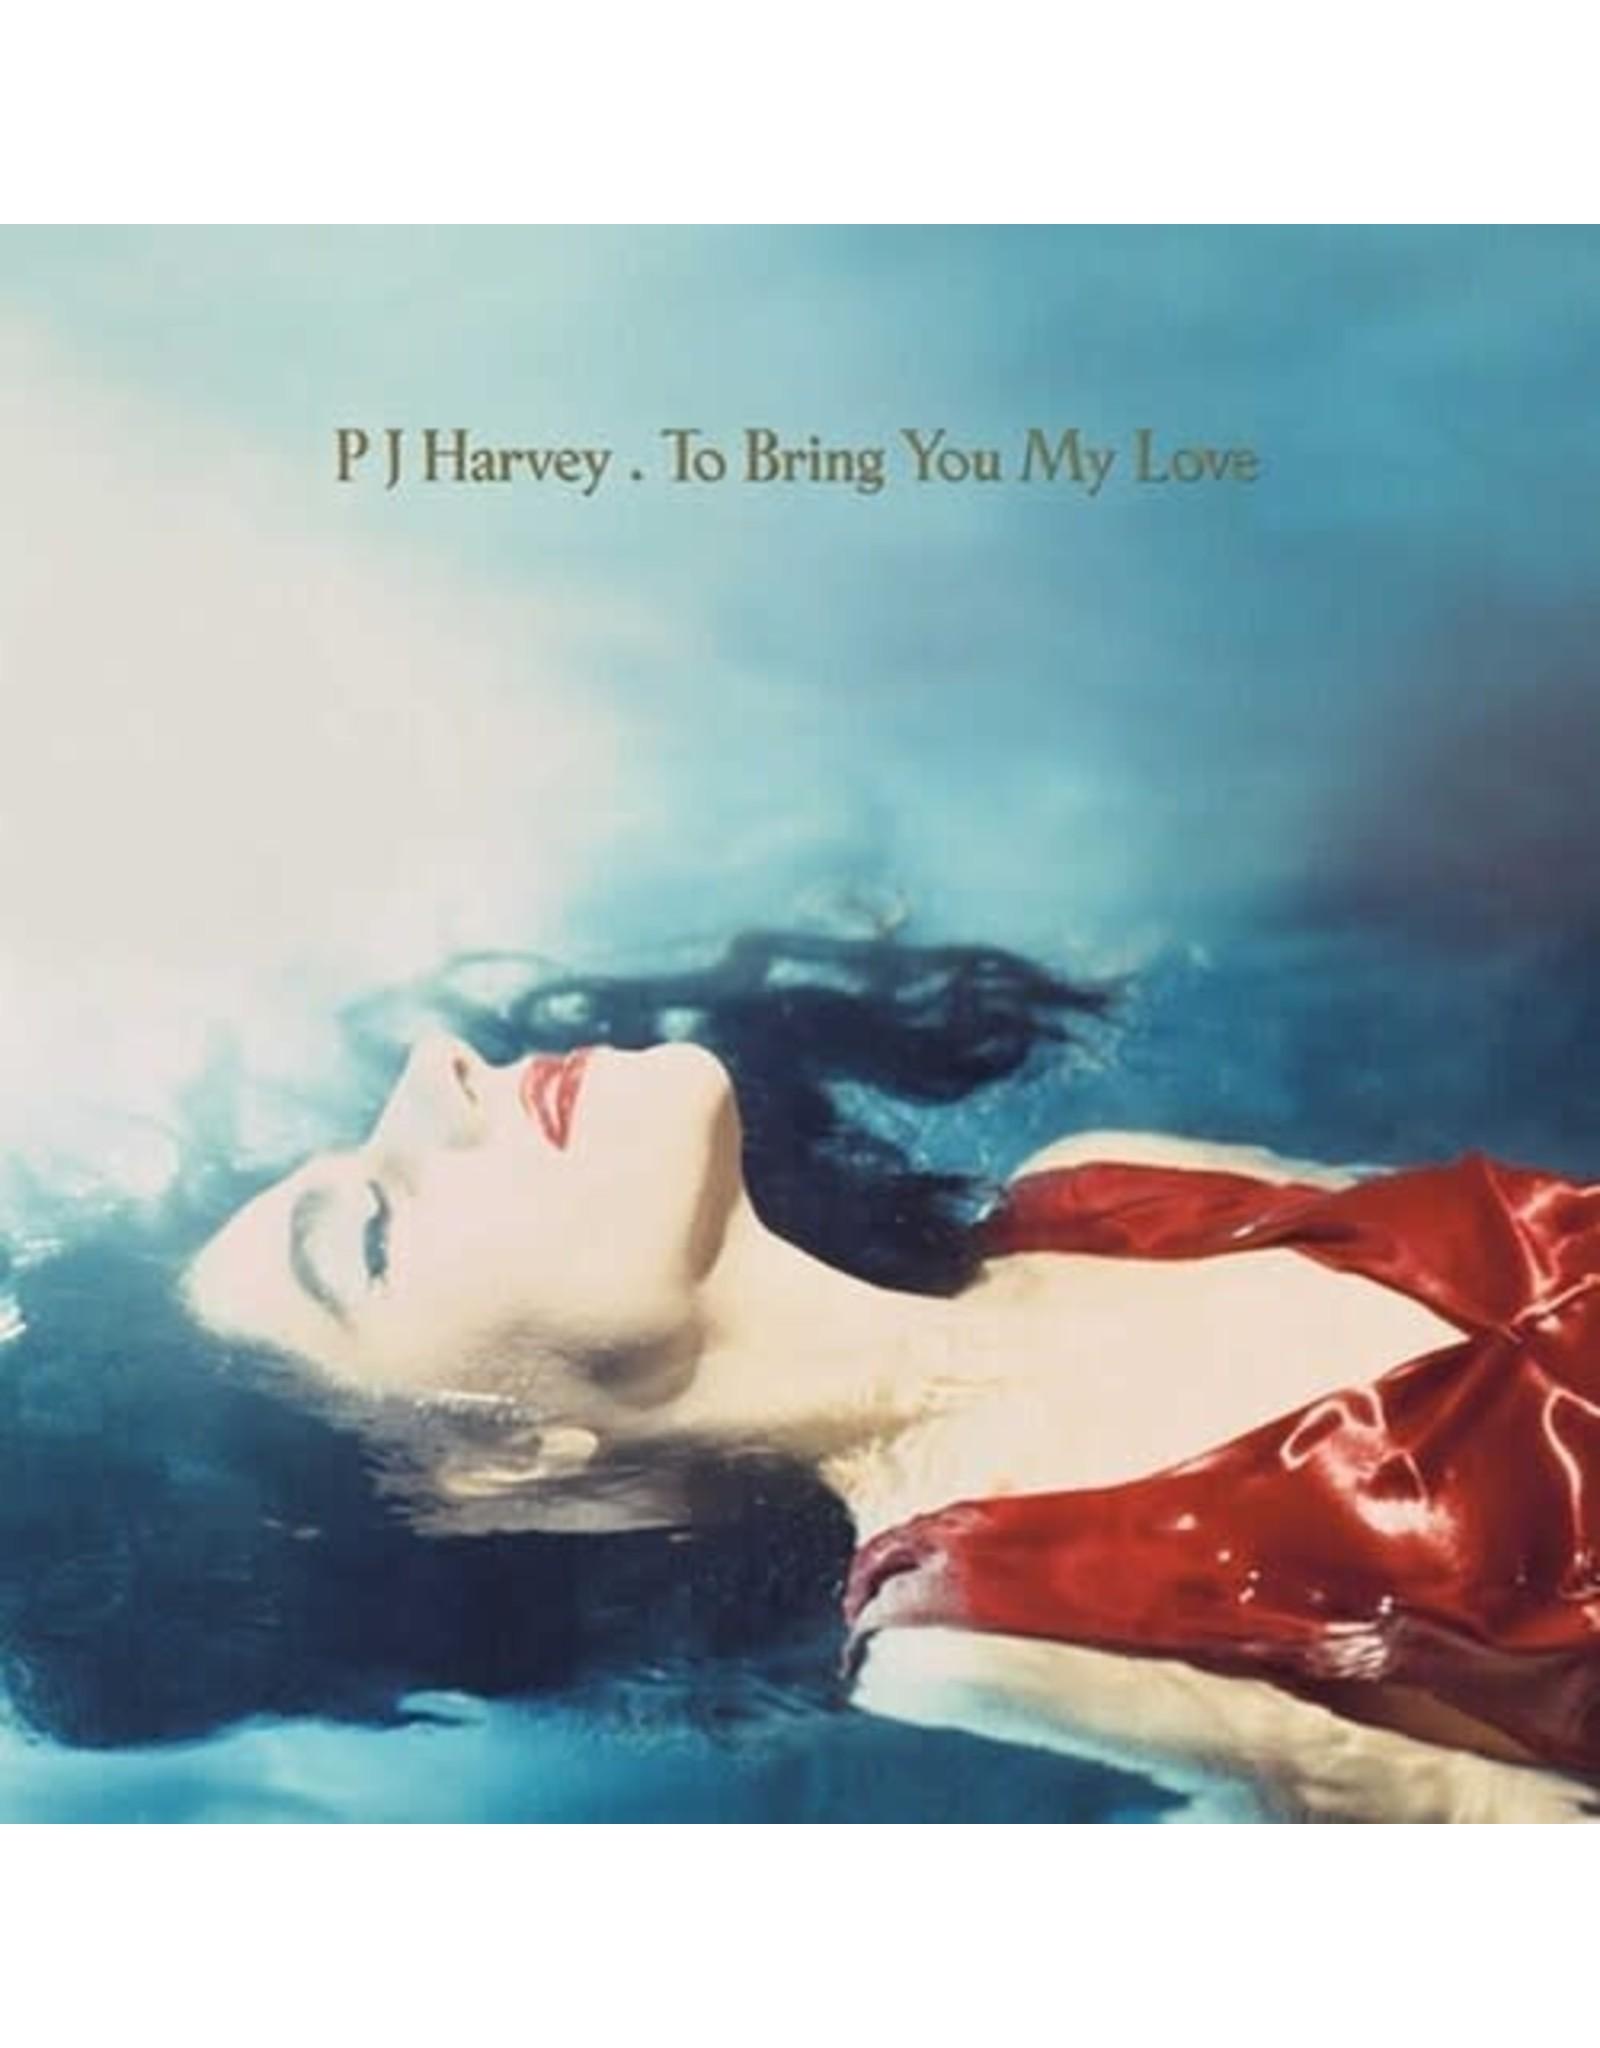 New Vinyl PJ Harvey - To Bring You My Love (Reissue) LP